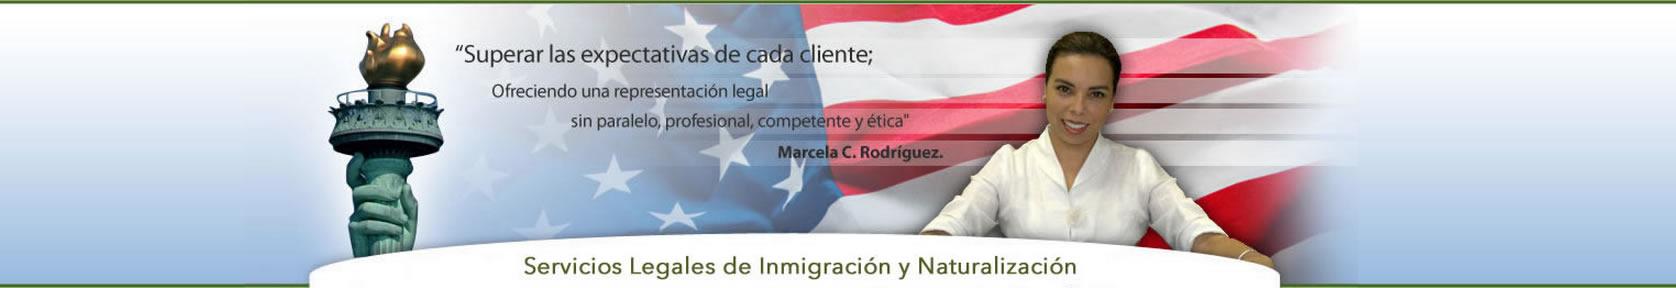 Immigrant Visas United States Immigration Attorney Charlotte NC Usa